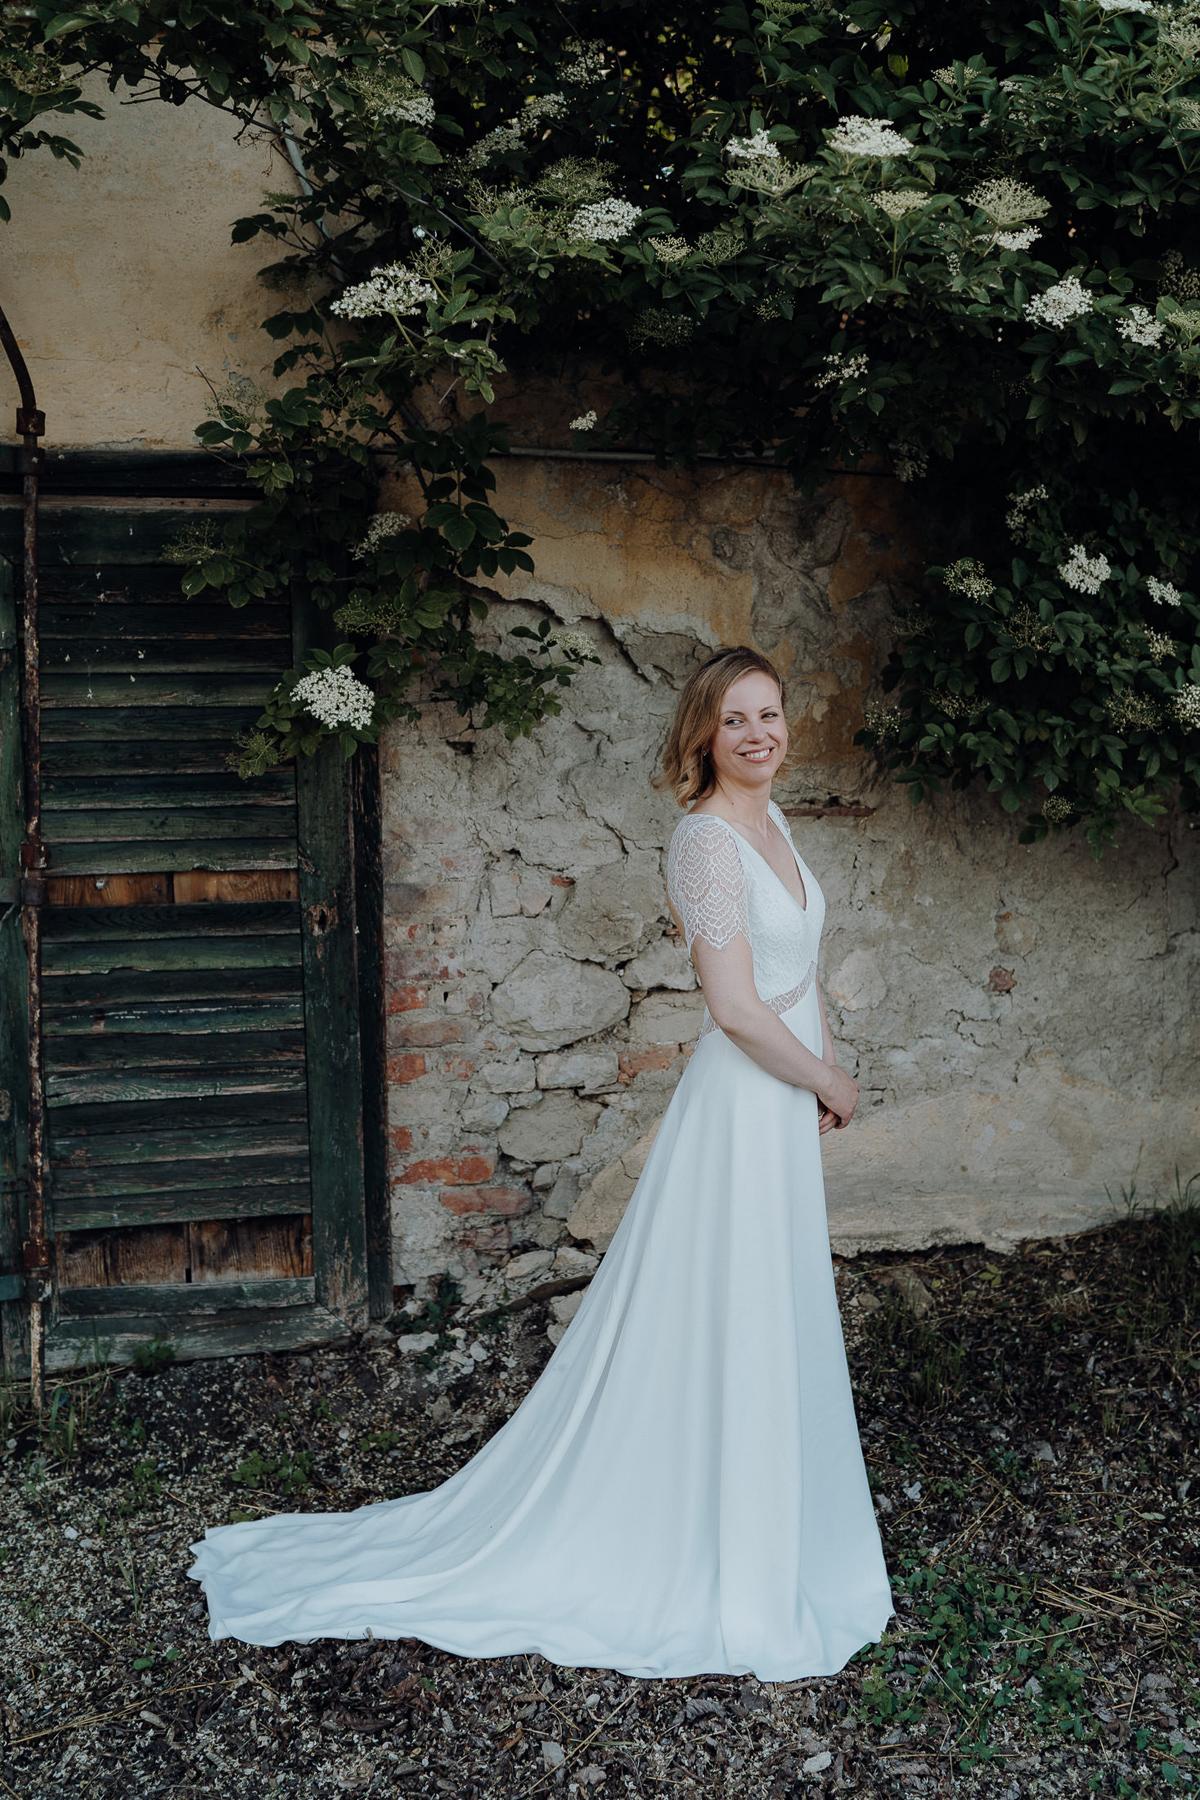 bridal portrait at at Kalandahaus Esterhazy Winery wedding